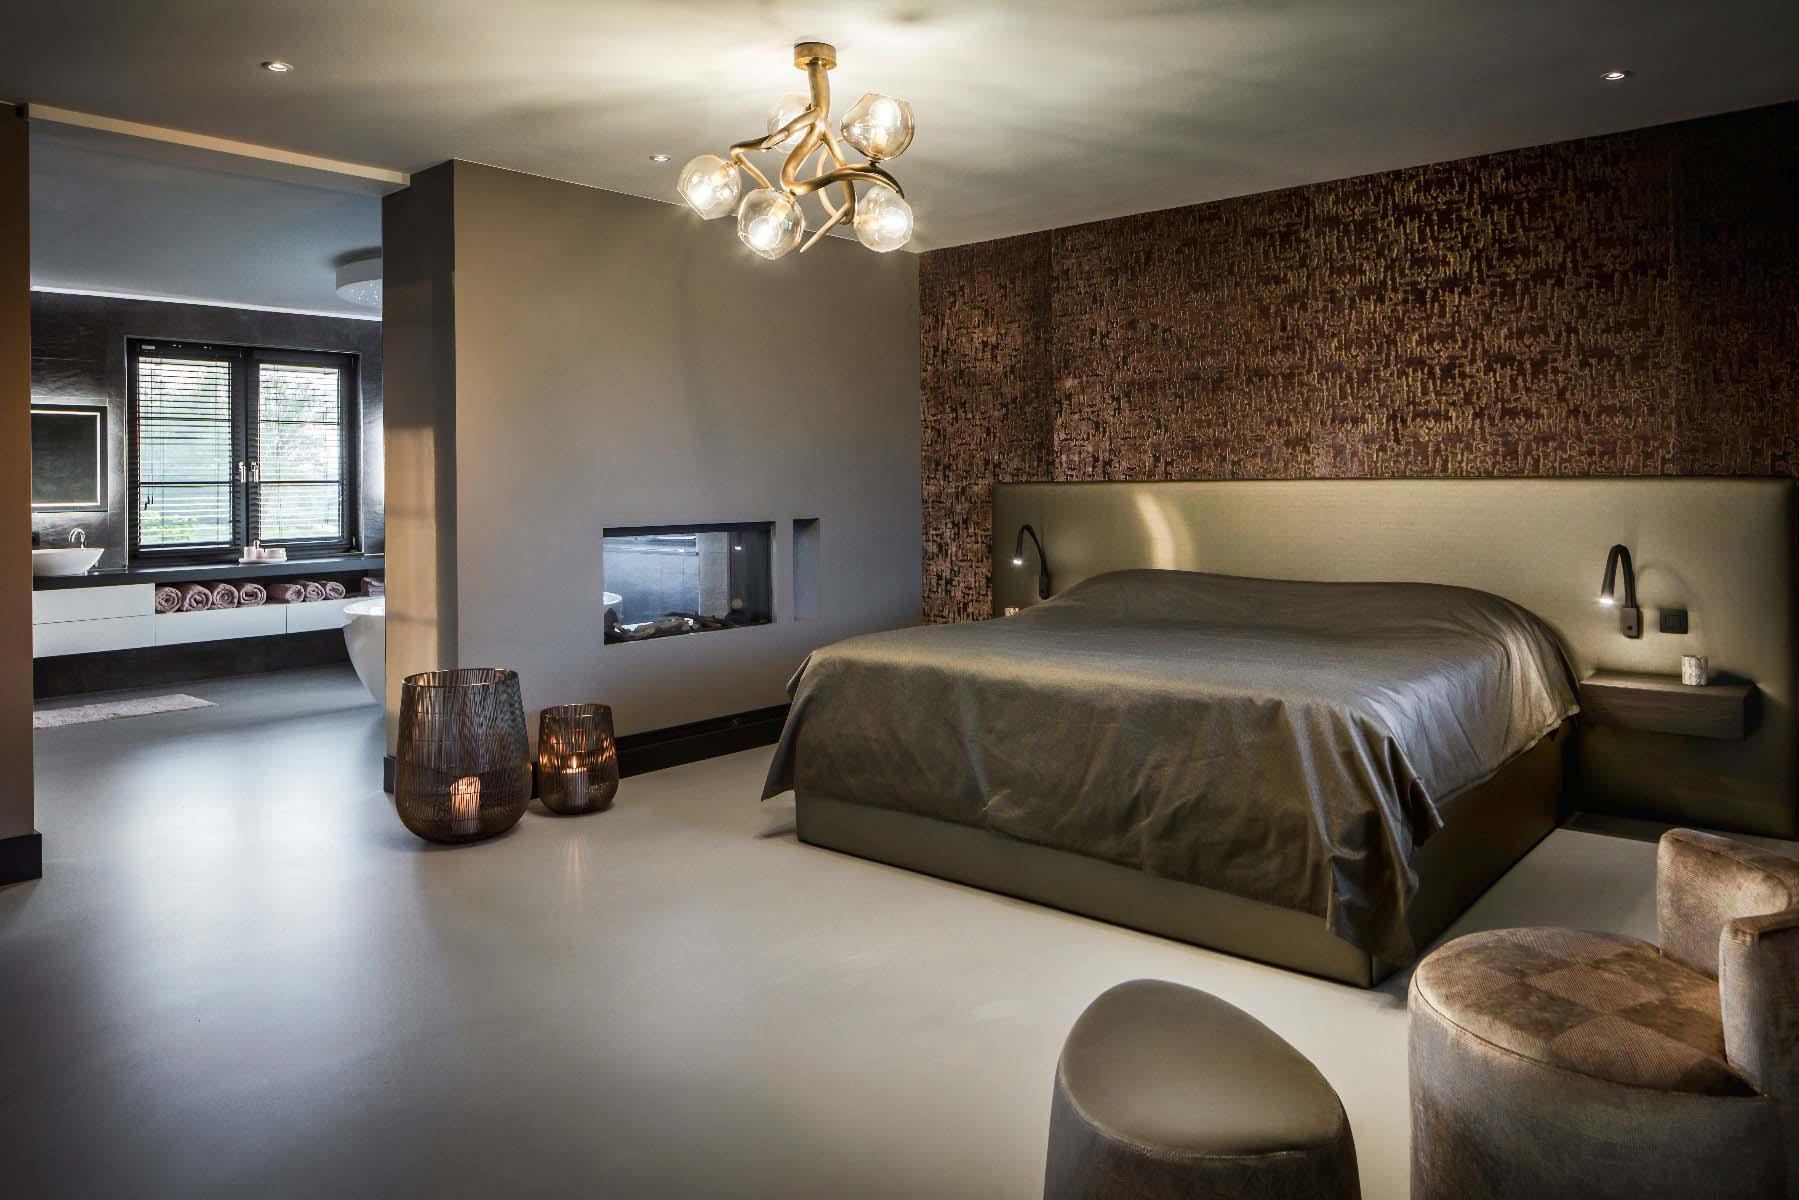 Residence, Rotterdam, The Netherlands